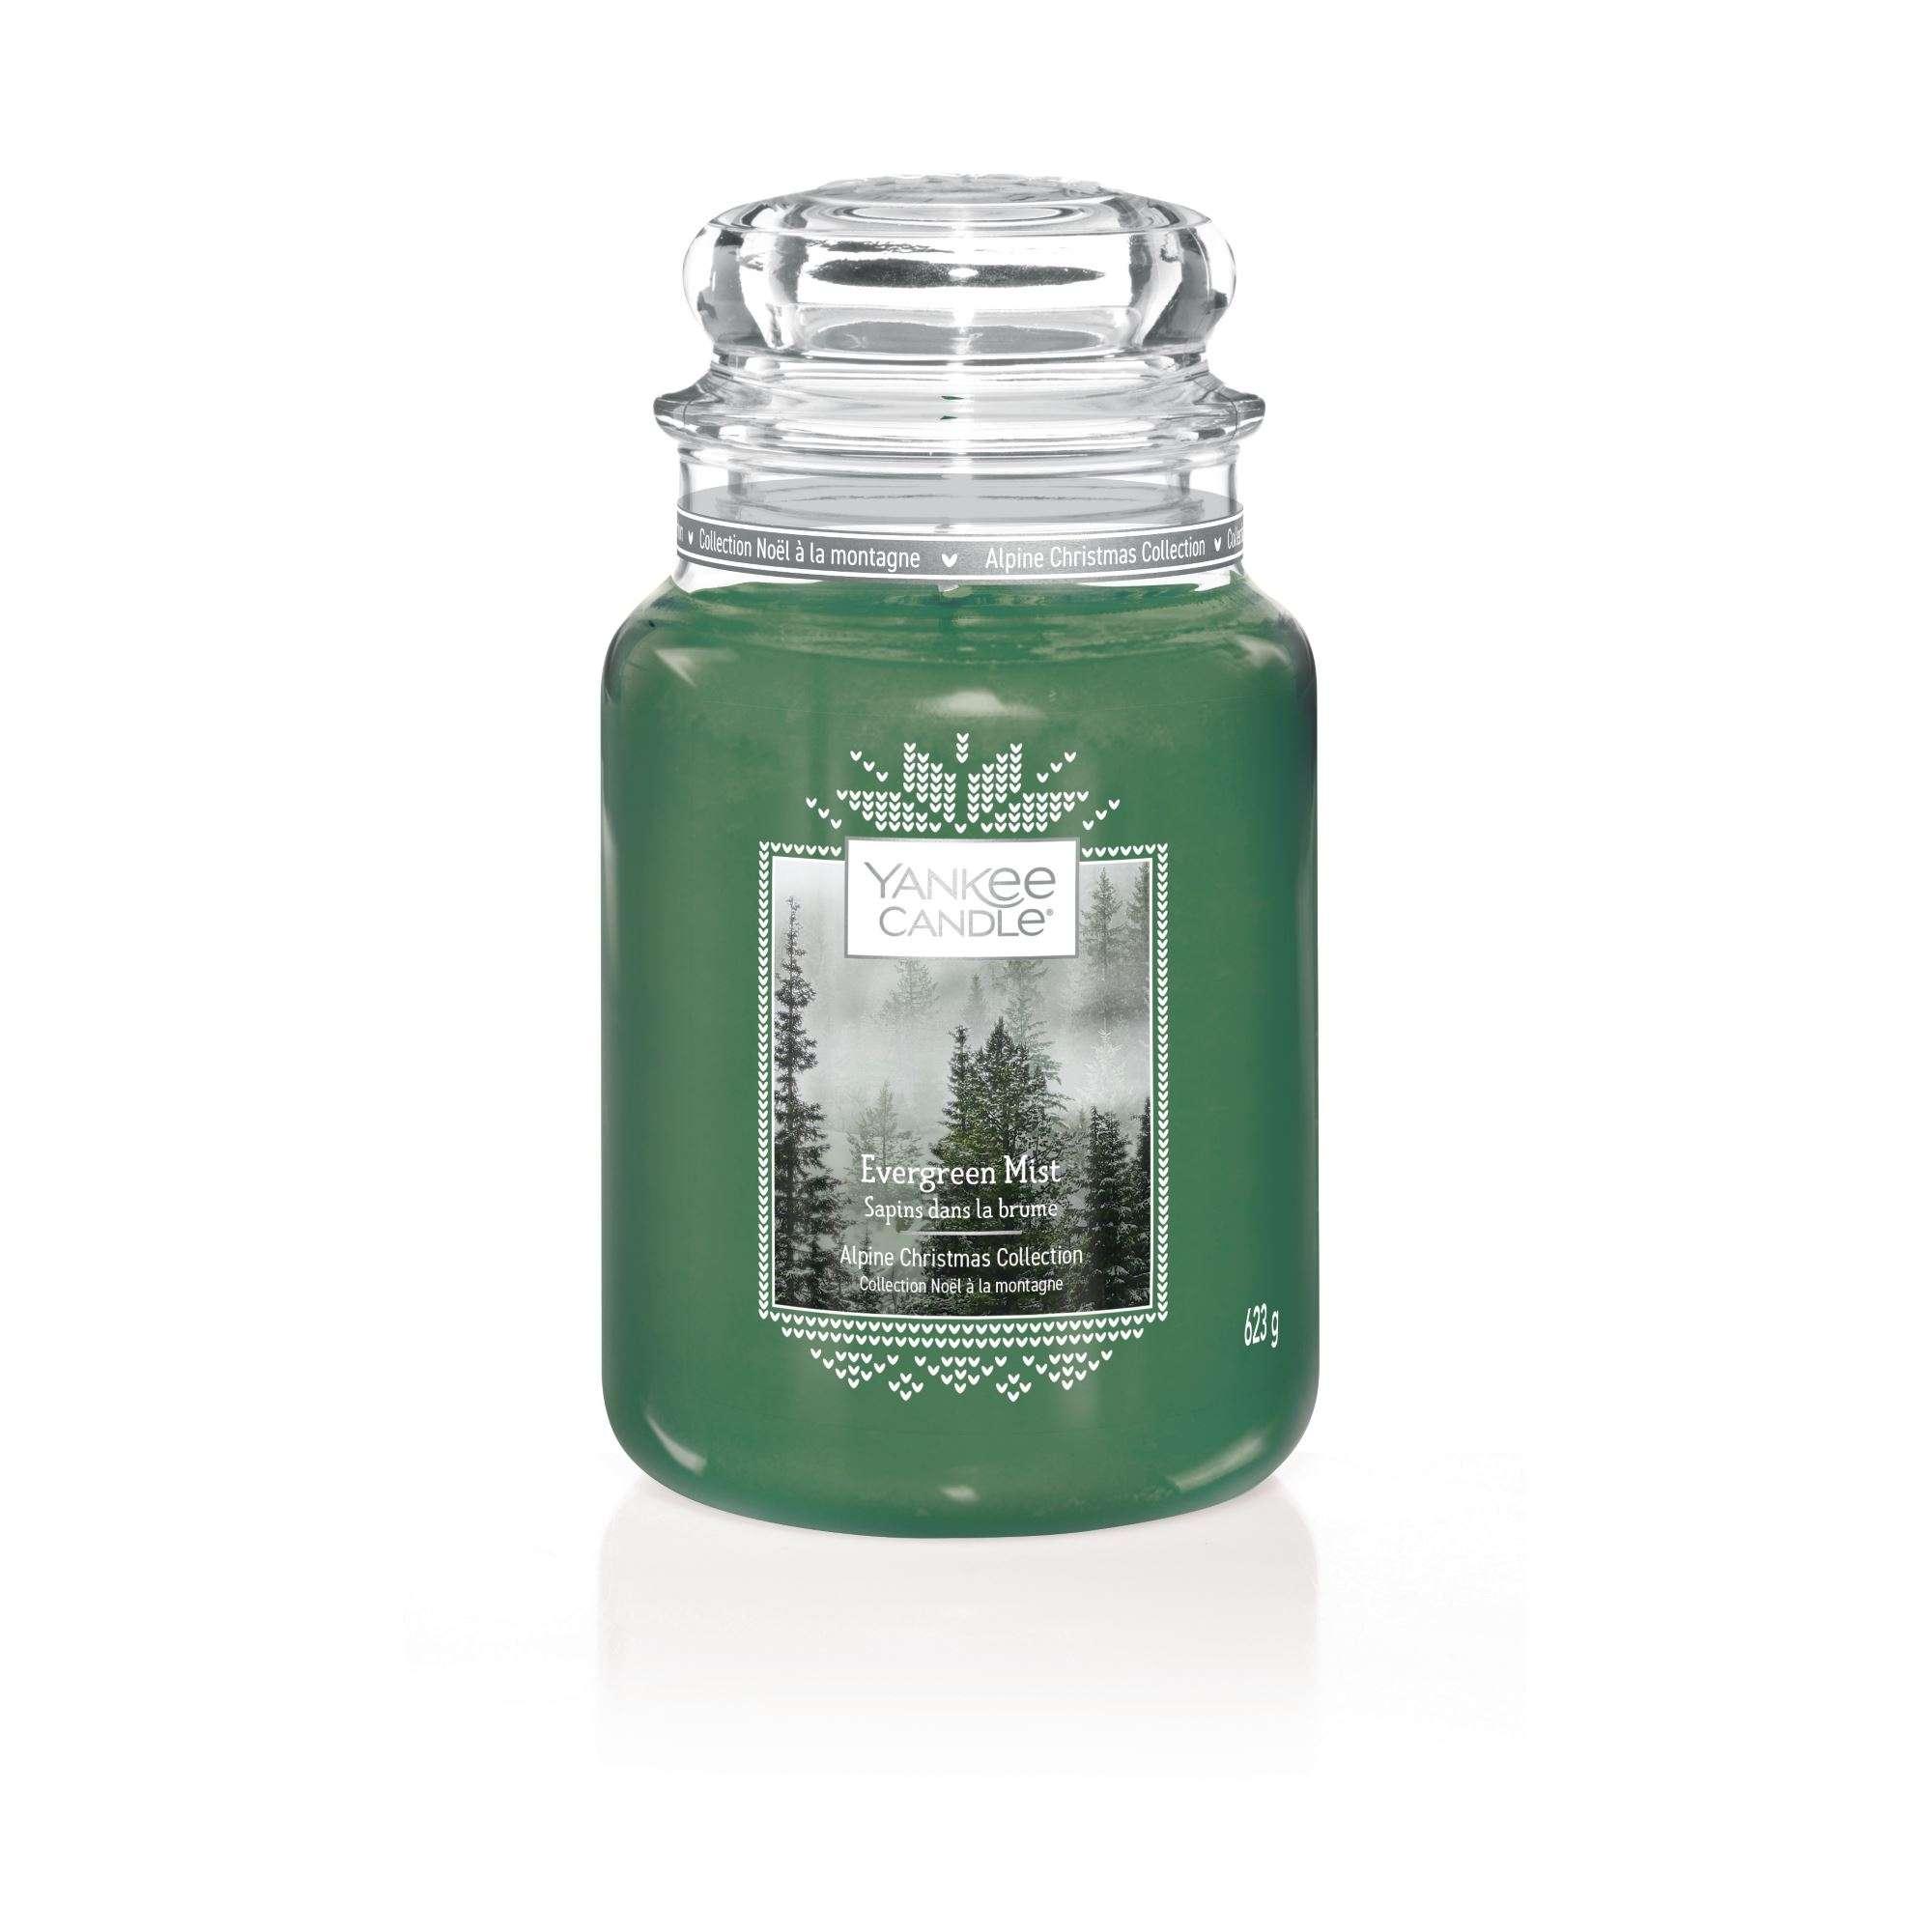 Yankee Candle Wedding Day Grosses Glas 623 g duftkerze